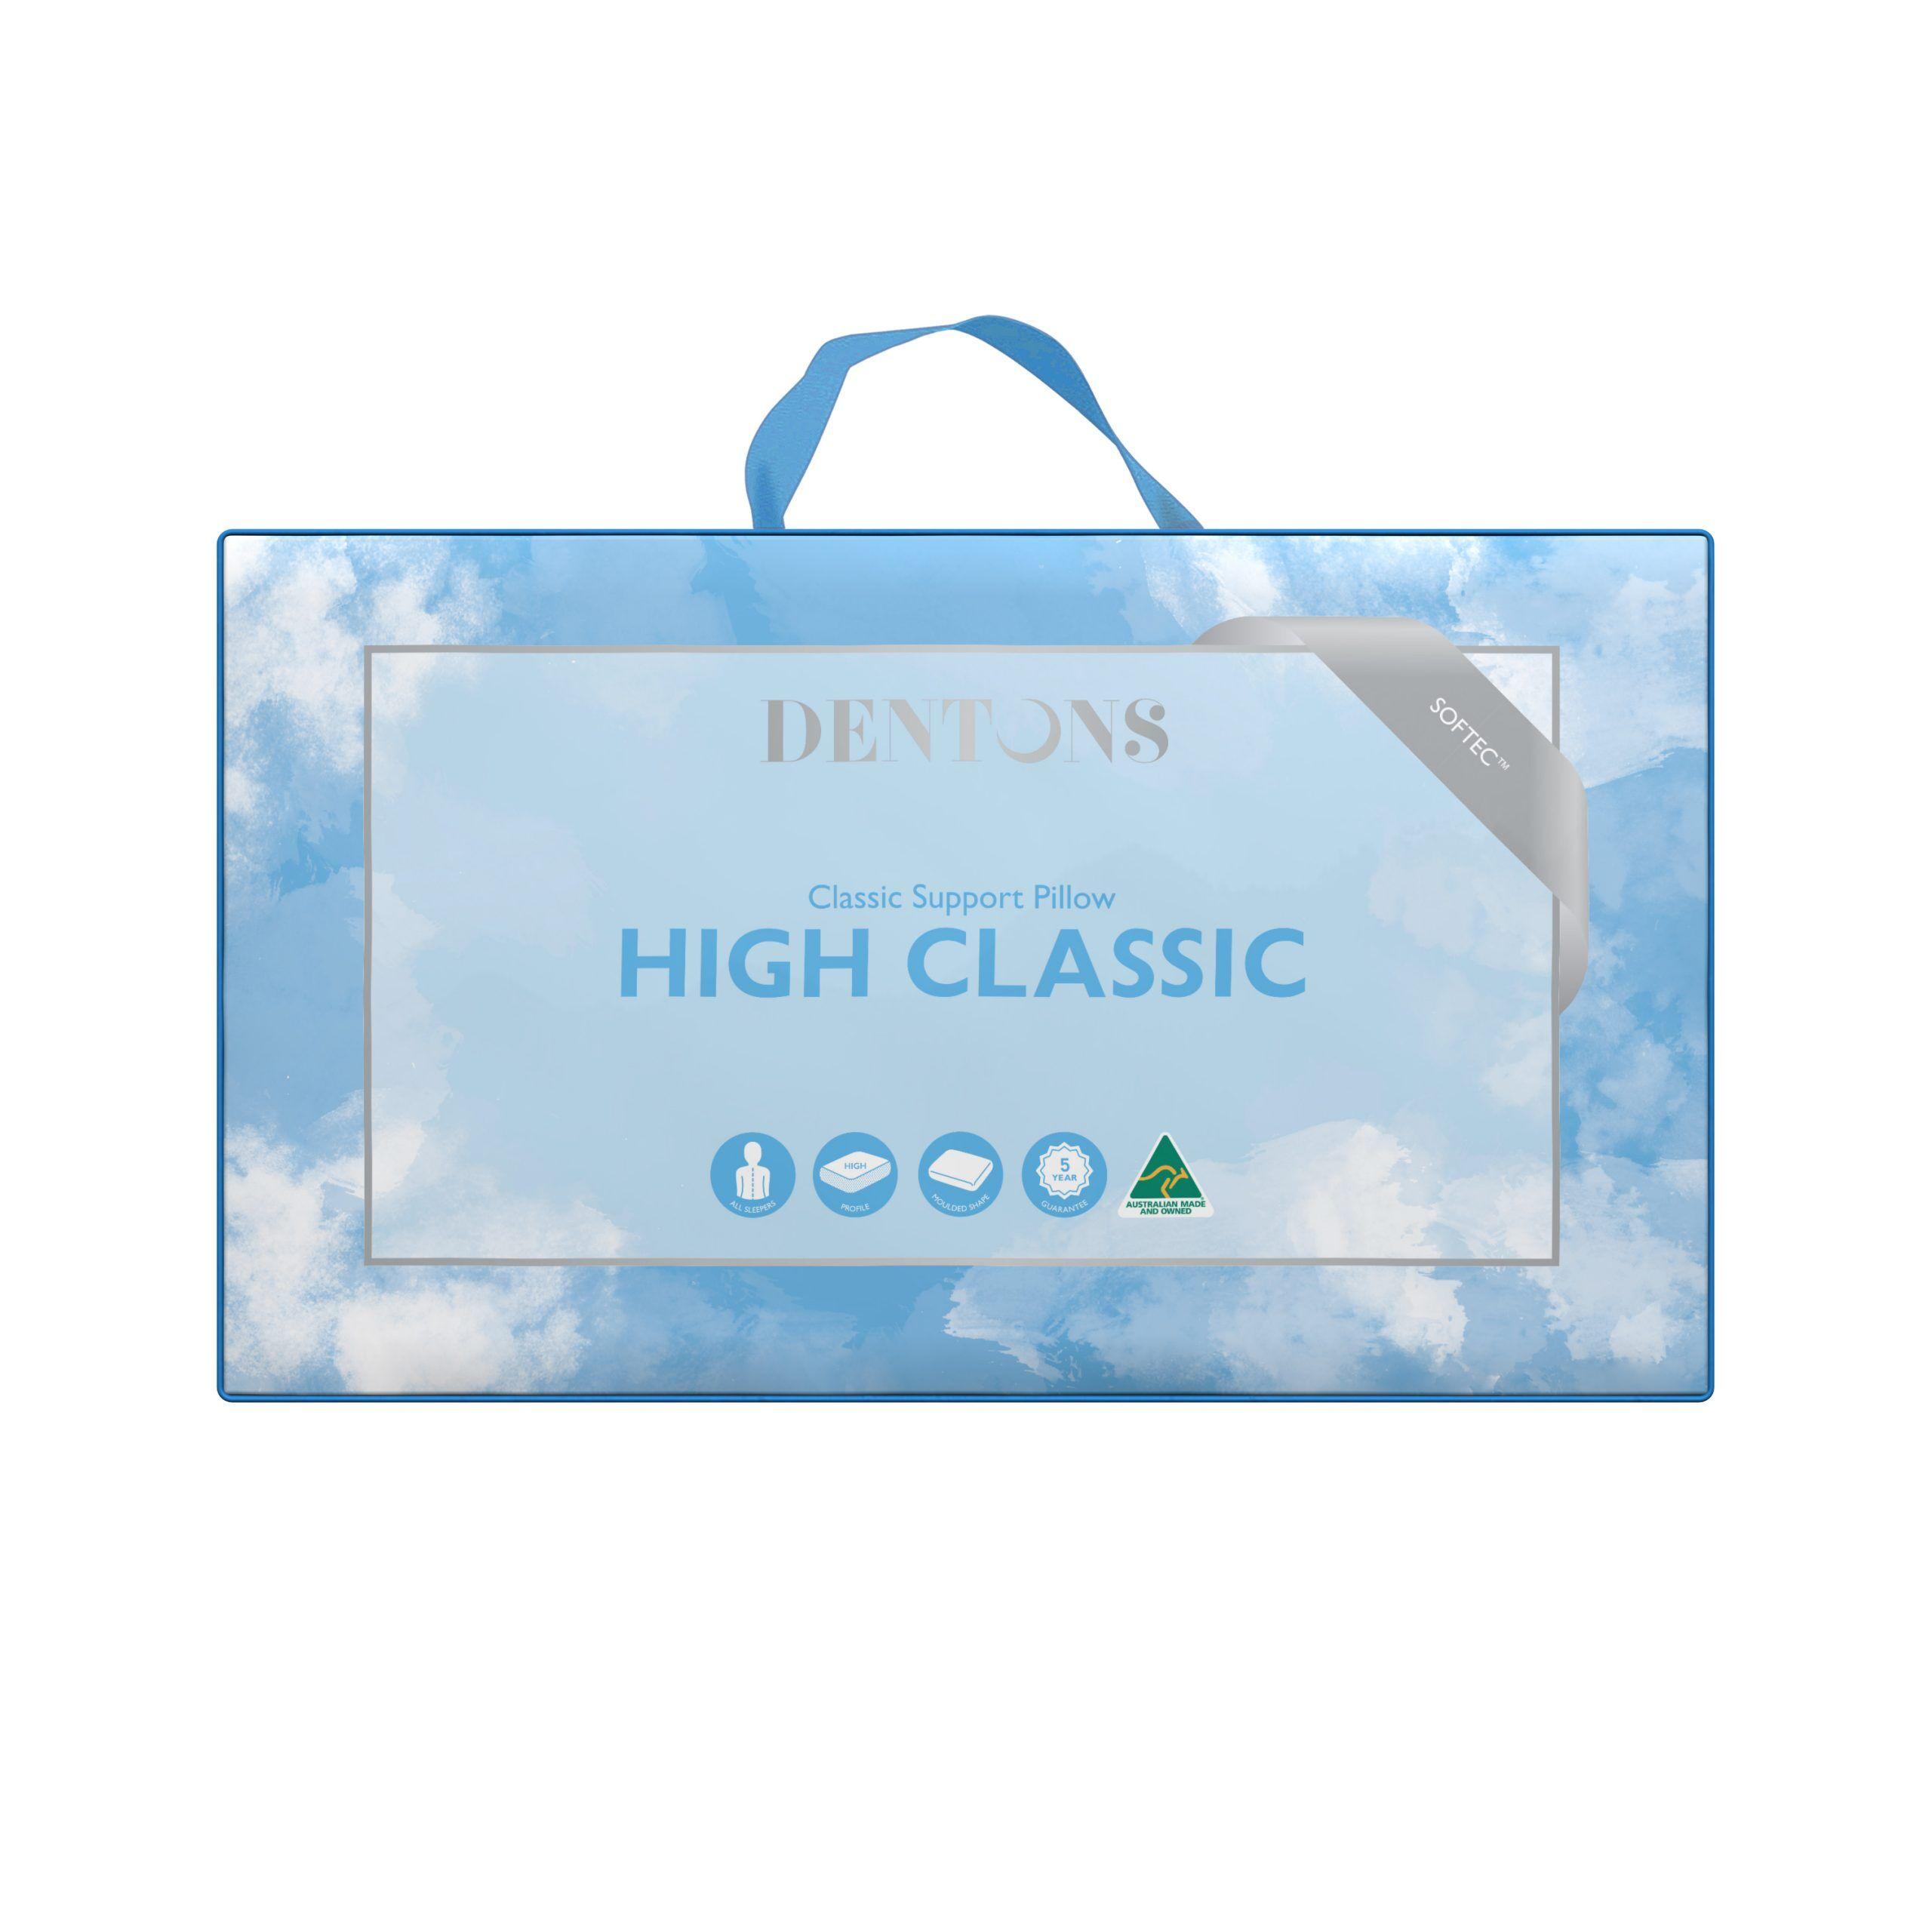 Dentons High Classic Pillow